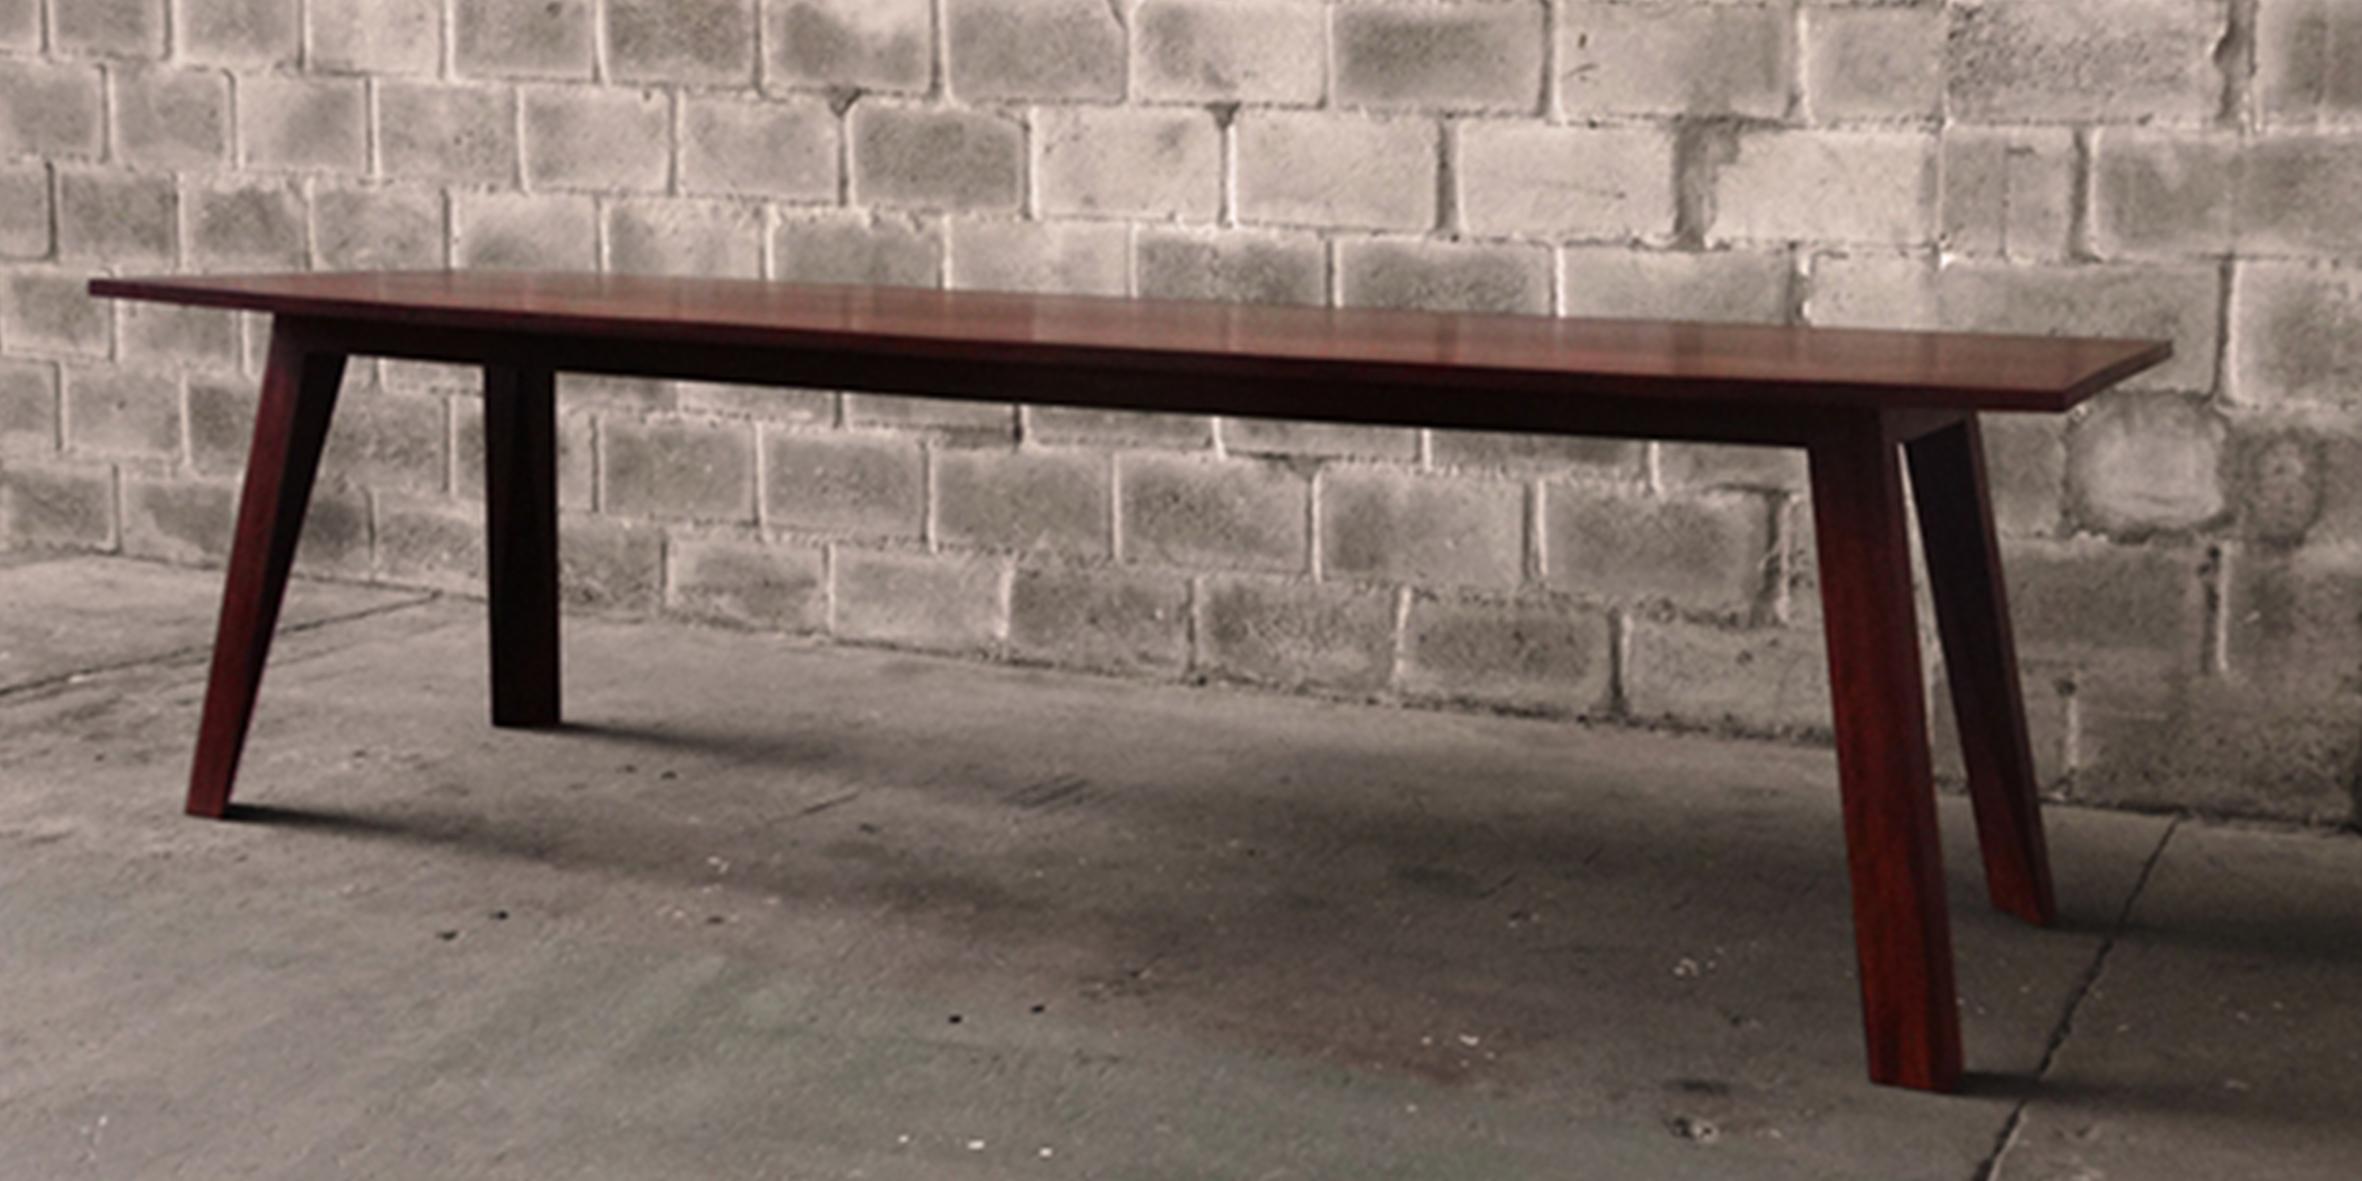 table 1, 2700 l x 1100 w x 730 h, reclaimed jarrah